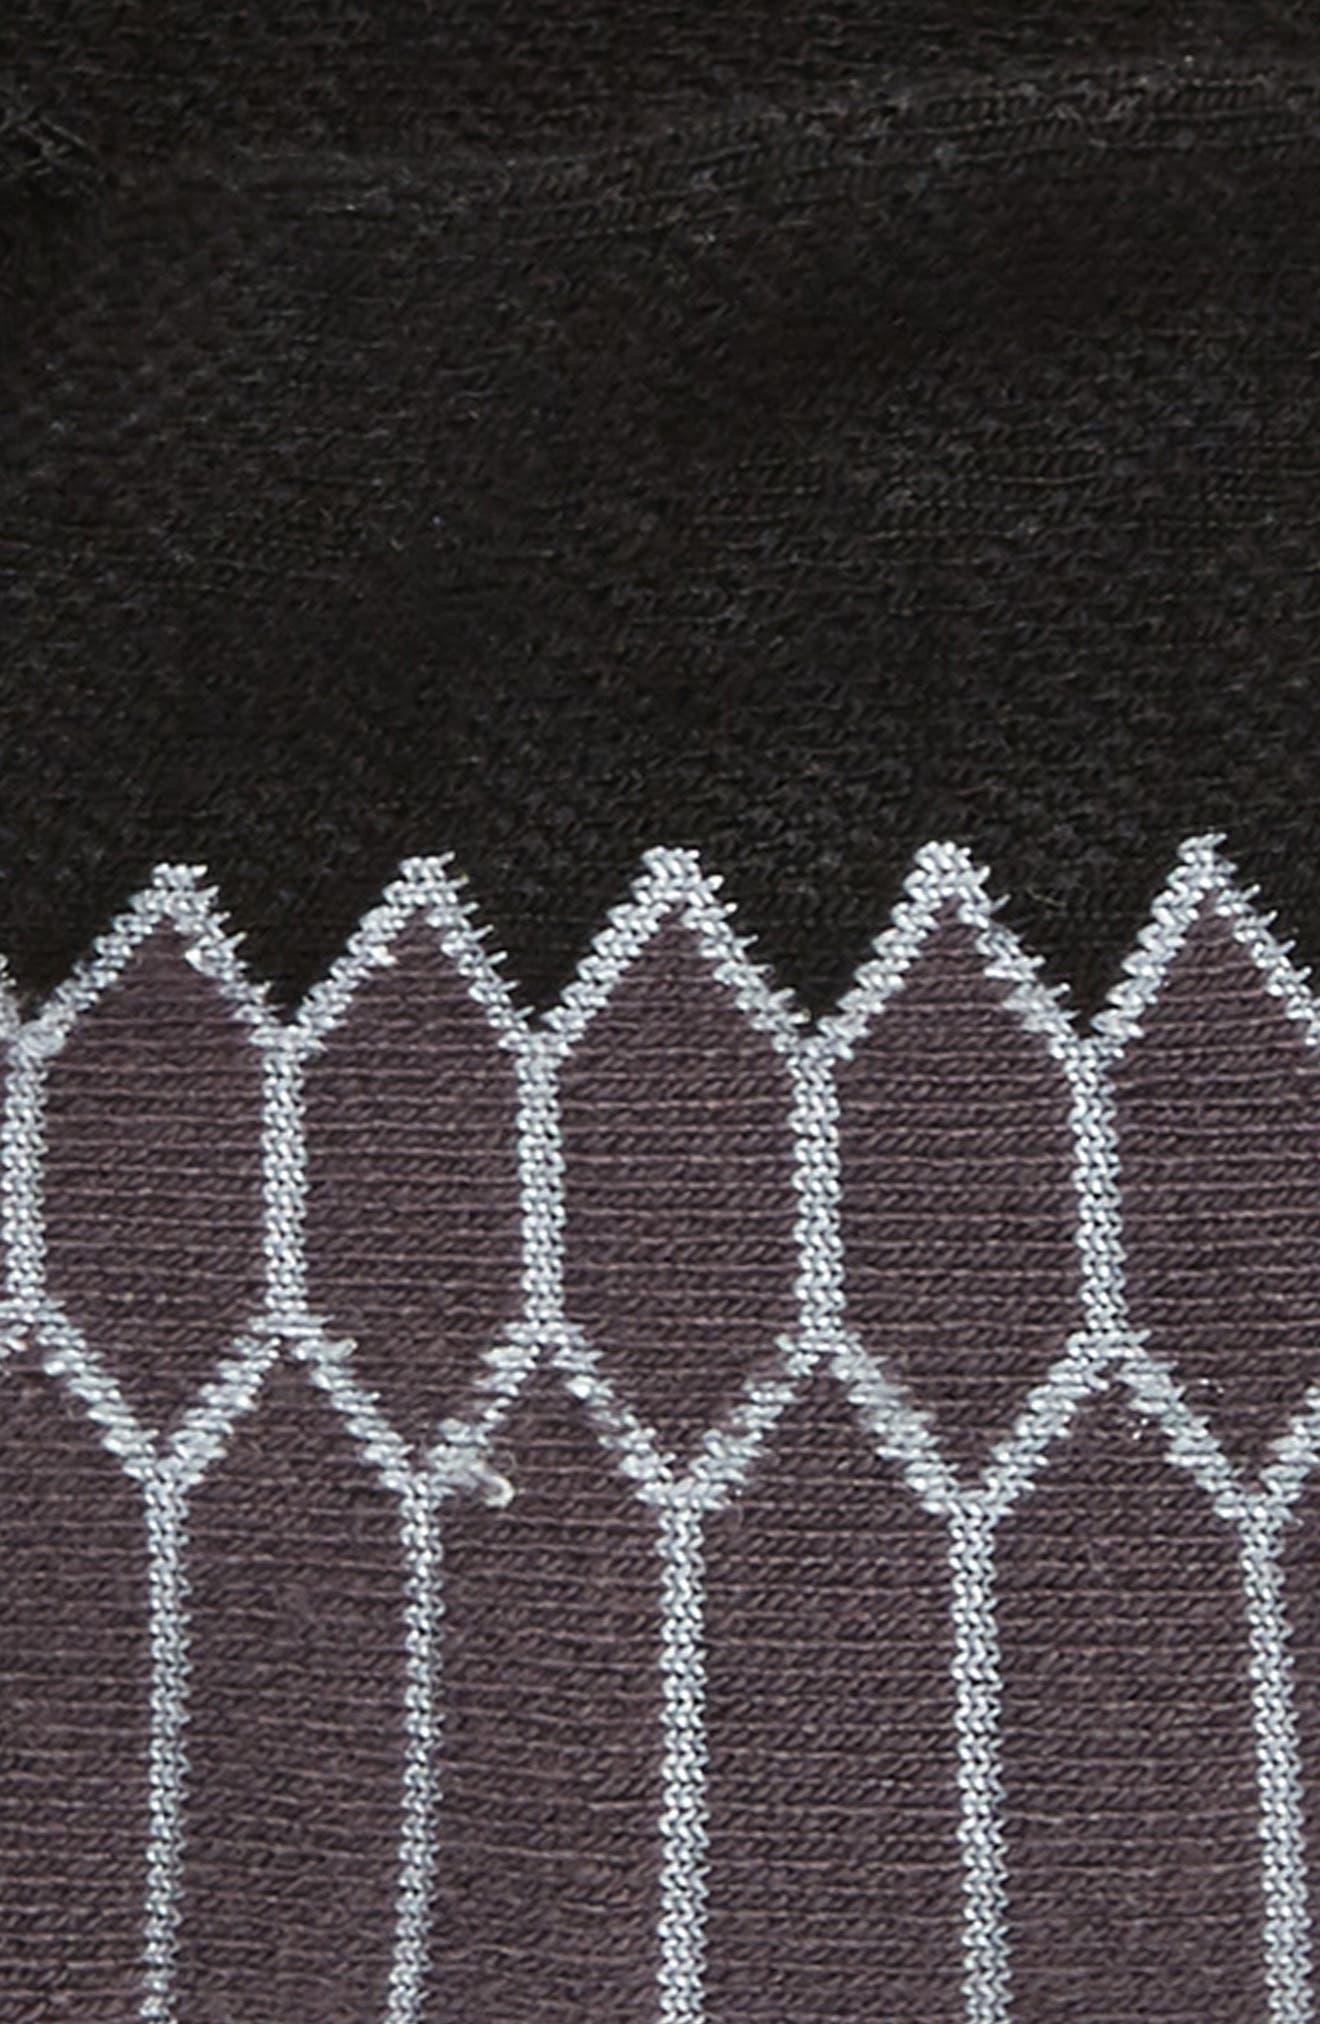 Silver Socks,                             Alternate thumbnail 2, color,                             Black/ Carbon